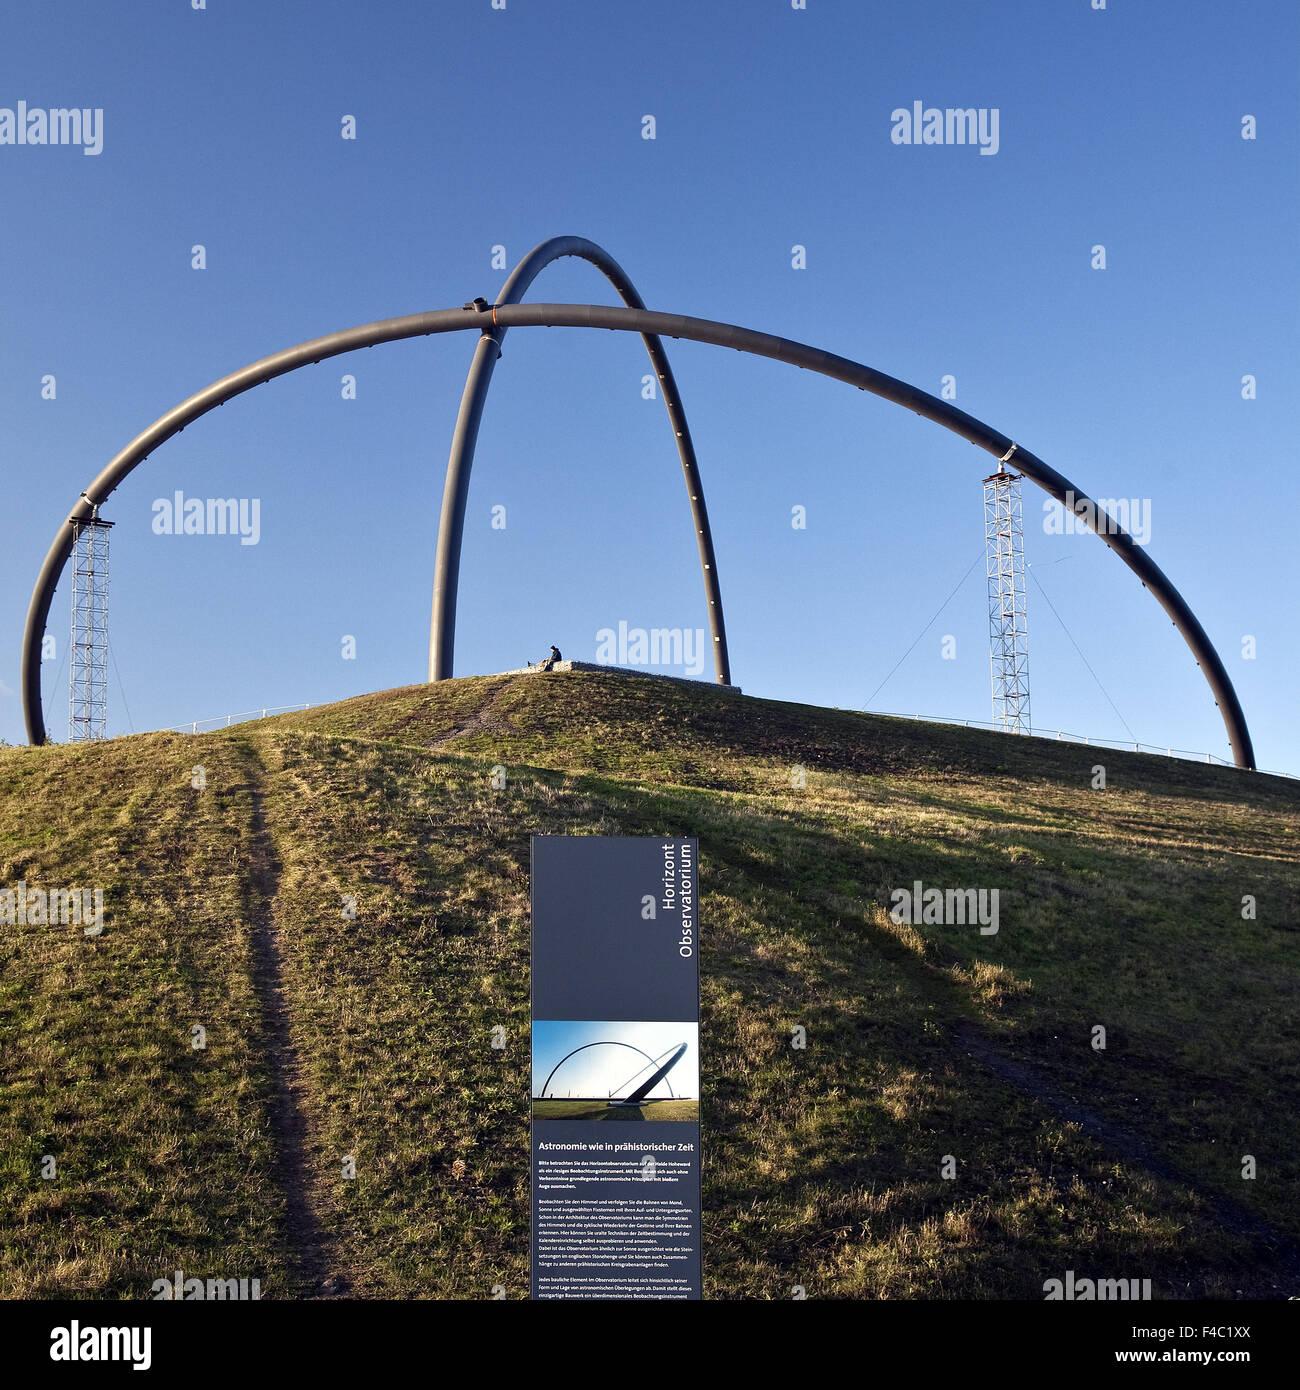 Horizon Observatory, Hoheward, Herten, Germany - Stock Image